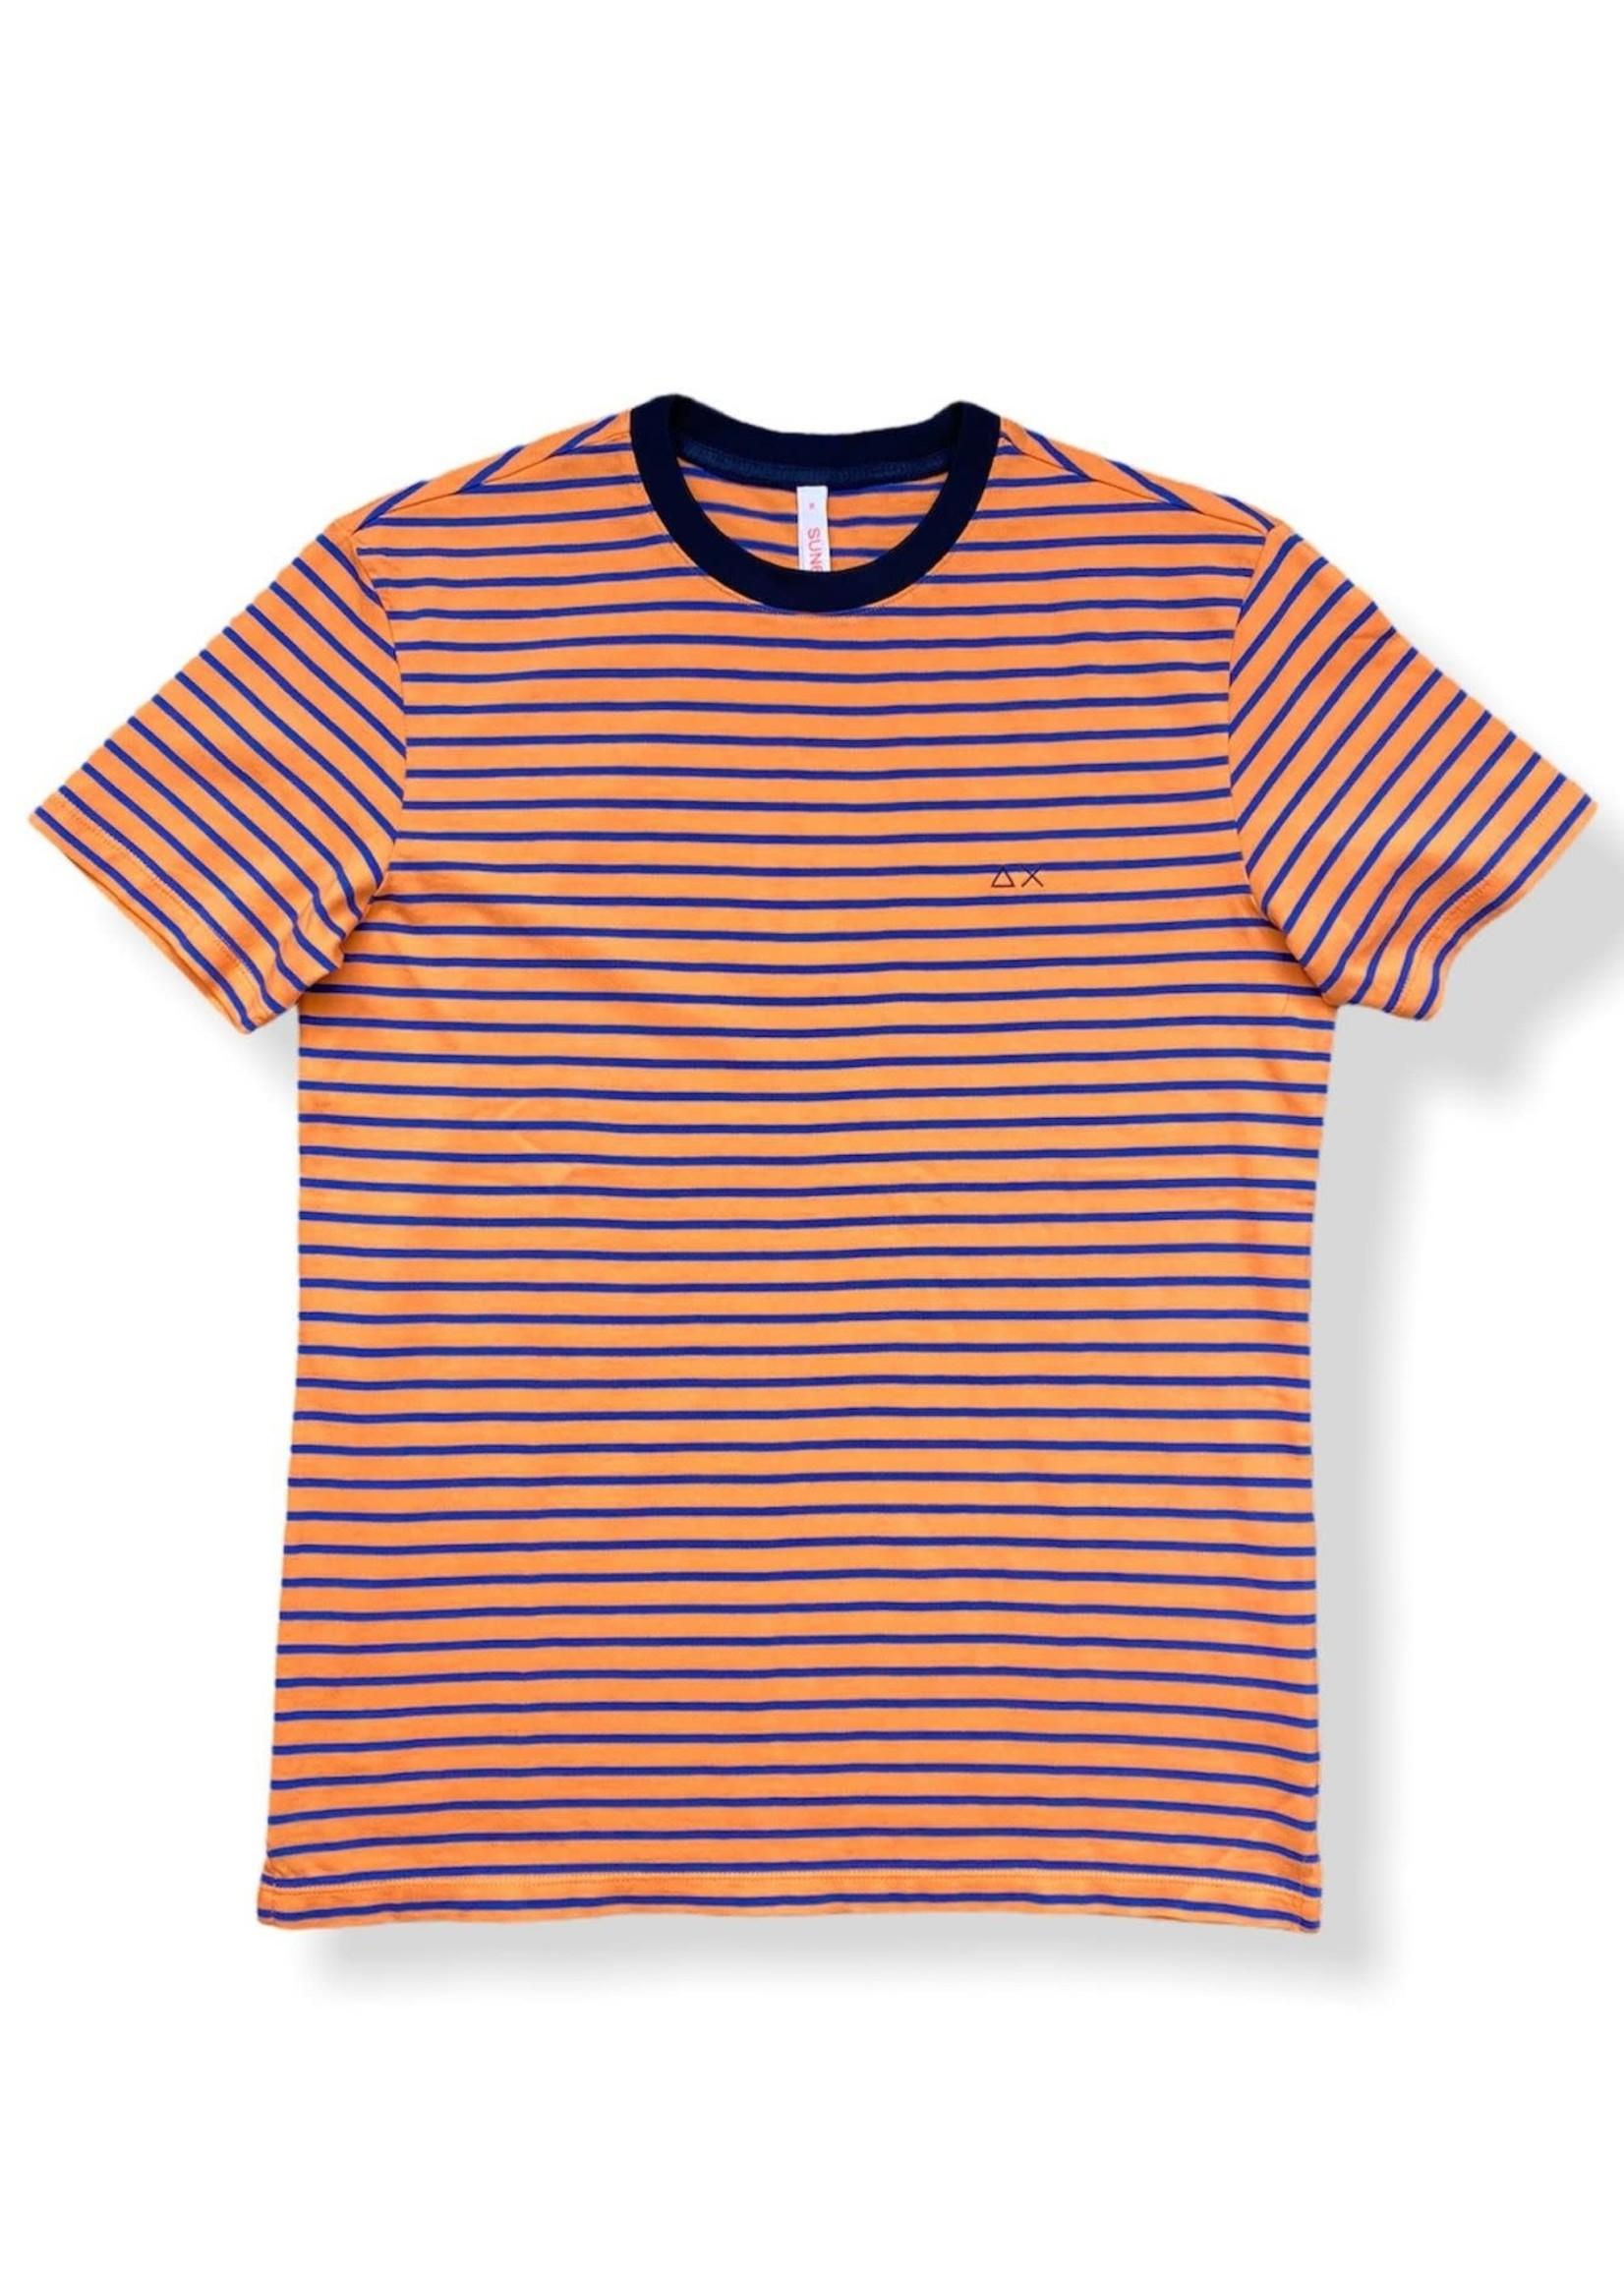 SUN68 T-Shirt Round Full Stripes   Orange/Bleu   SUN68